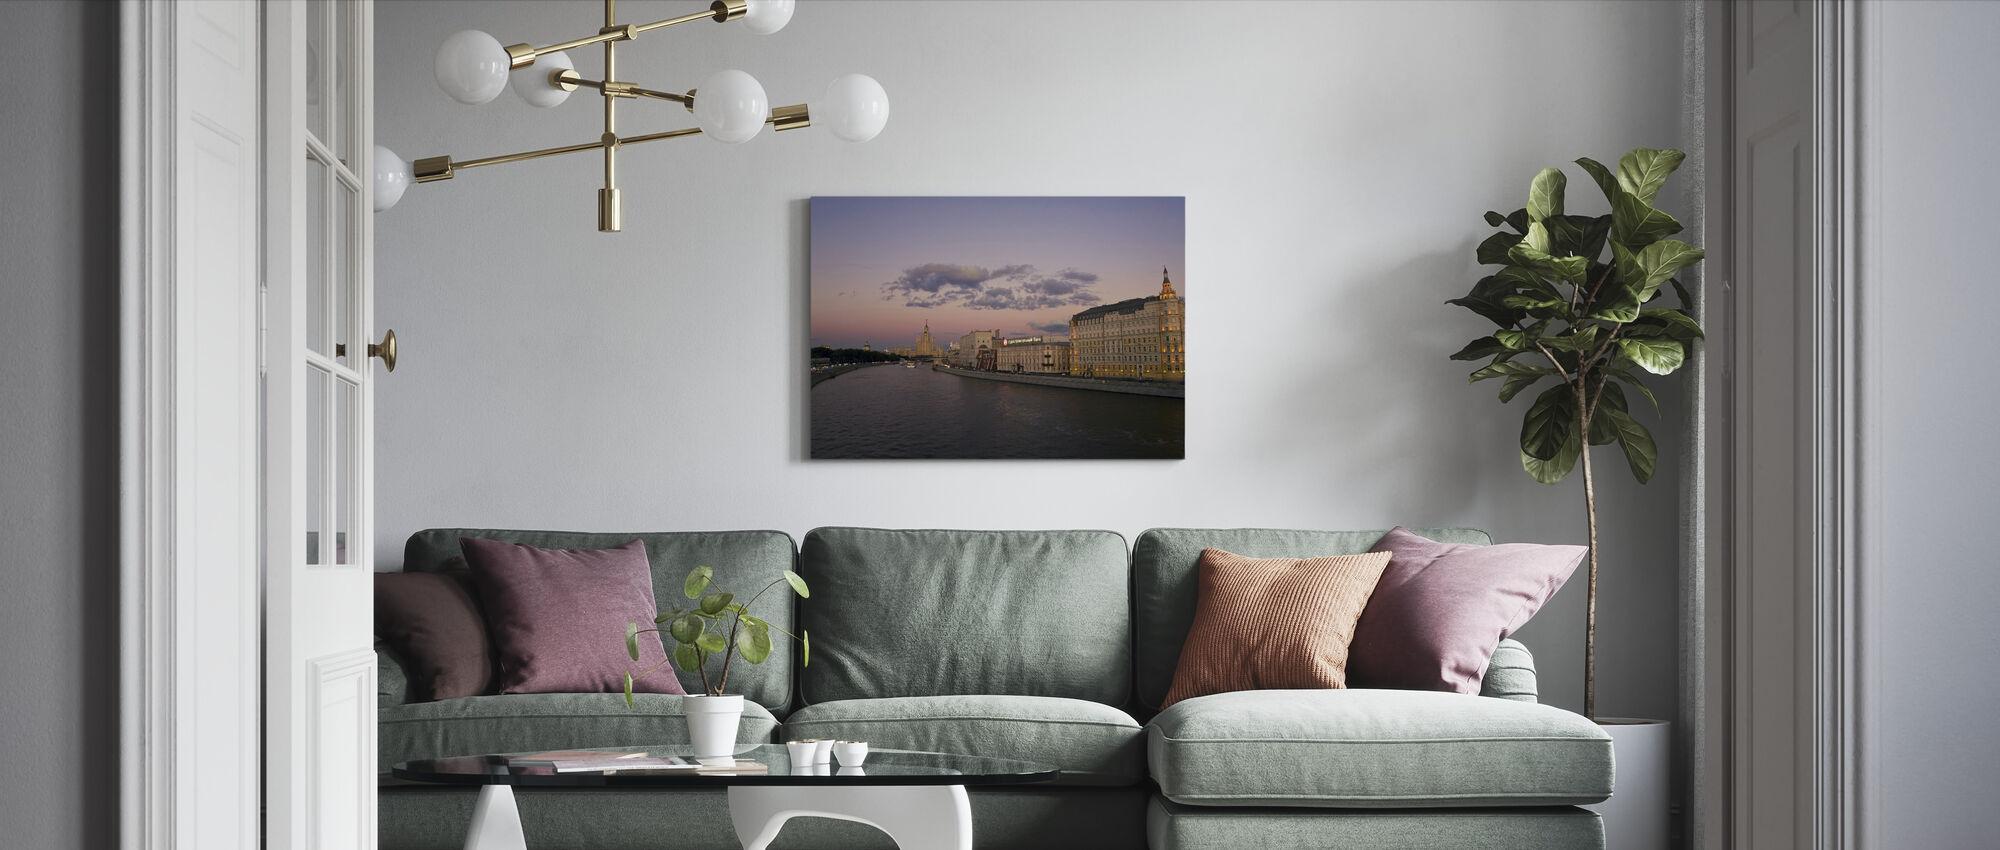 Kotelnicheskaya Embankment Apartments - Canvas print - Living Room